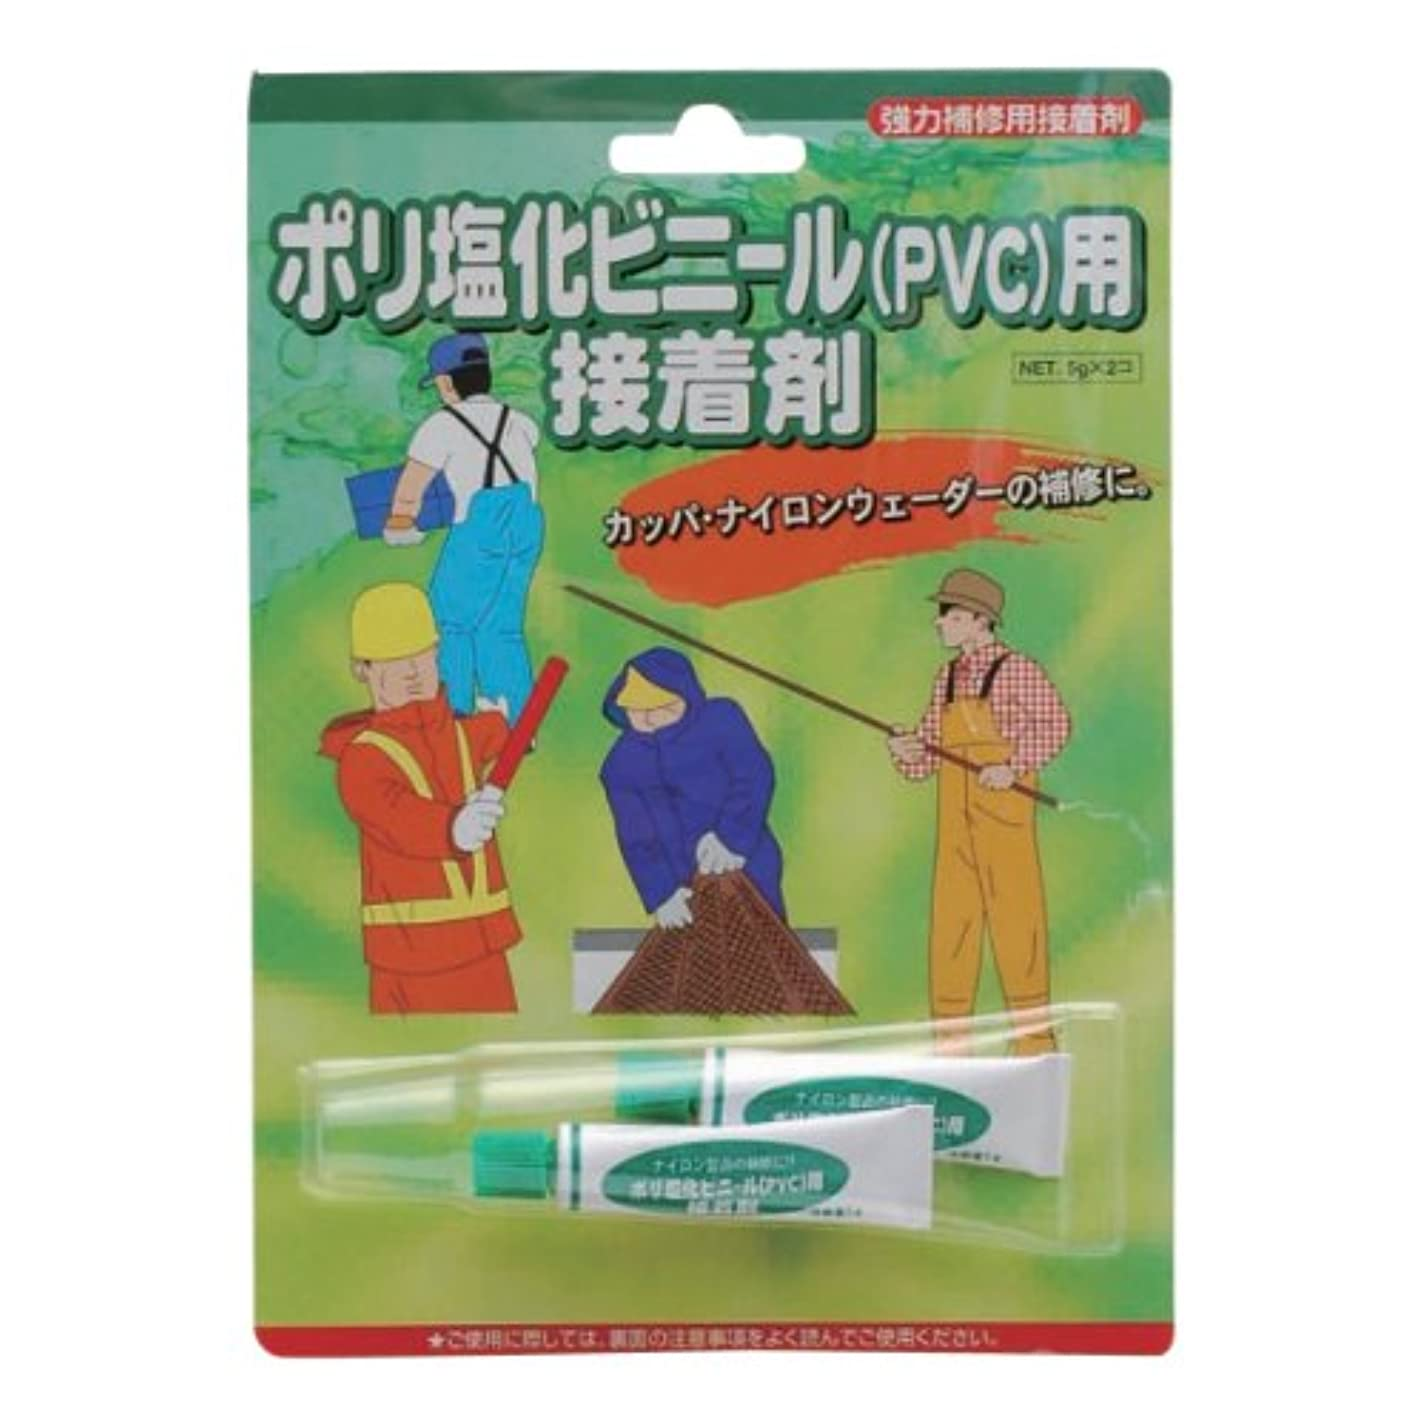 メイト閃光氷阪神素地 S-56 PVC用接着剤